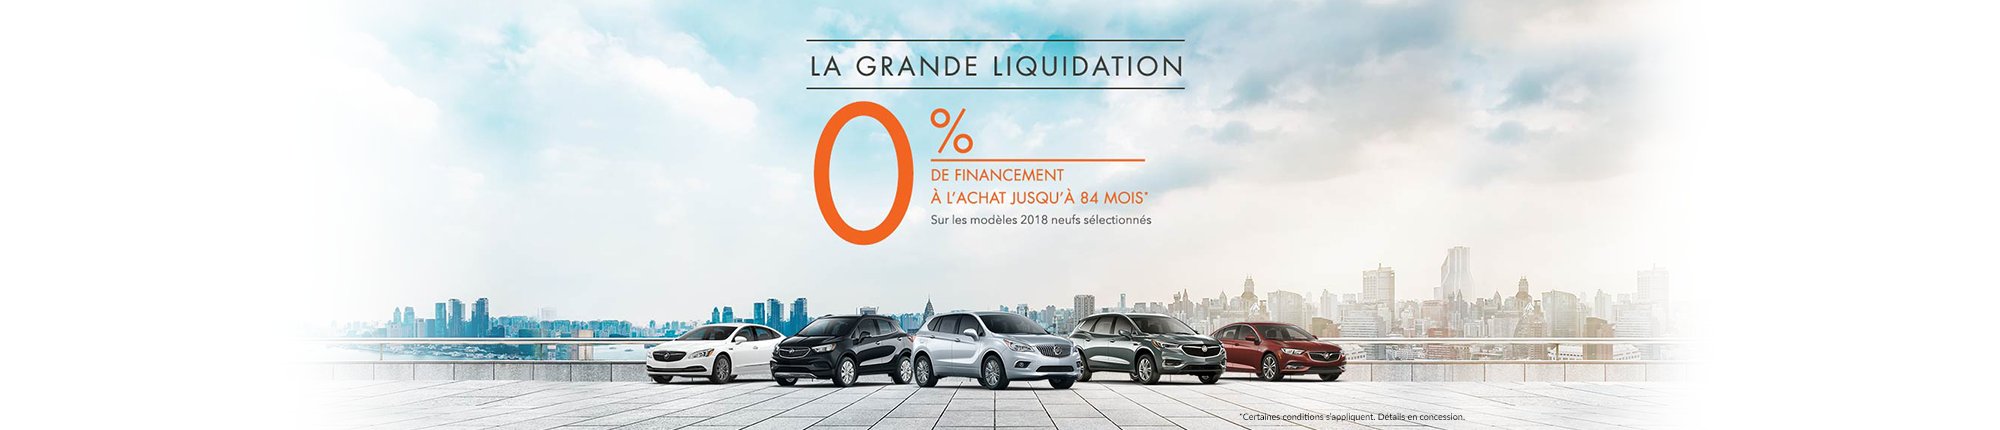 La grande liquidation